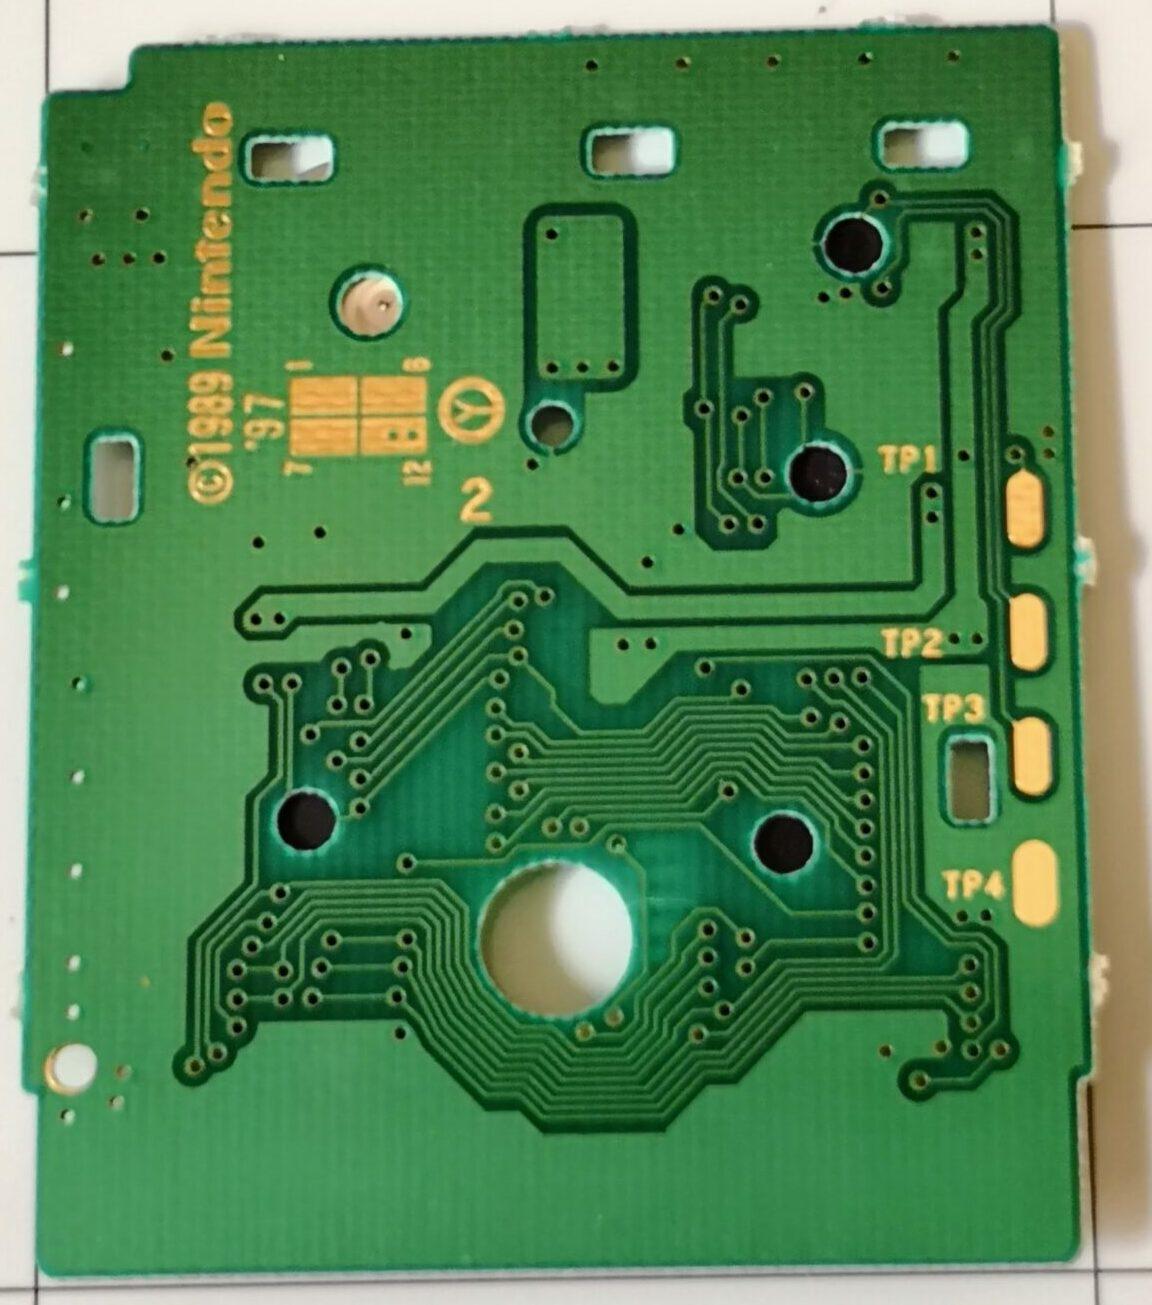 Metroid II: The Return of Samus, dettaglio posteriore Printed Circuit Board